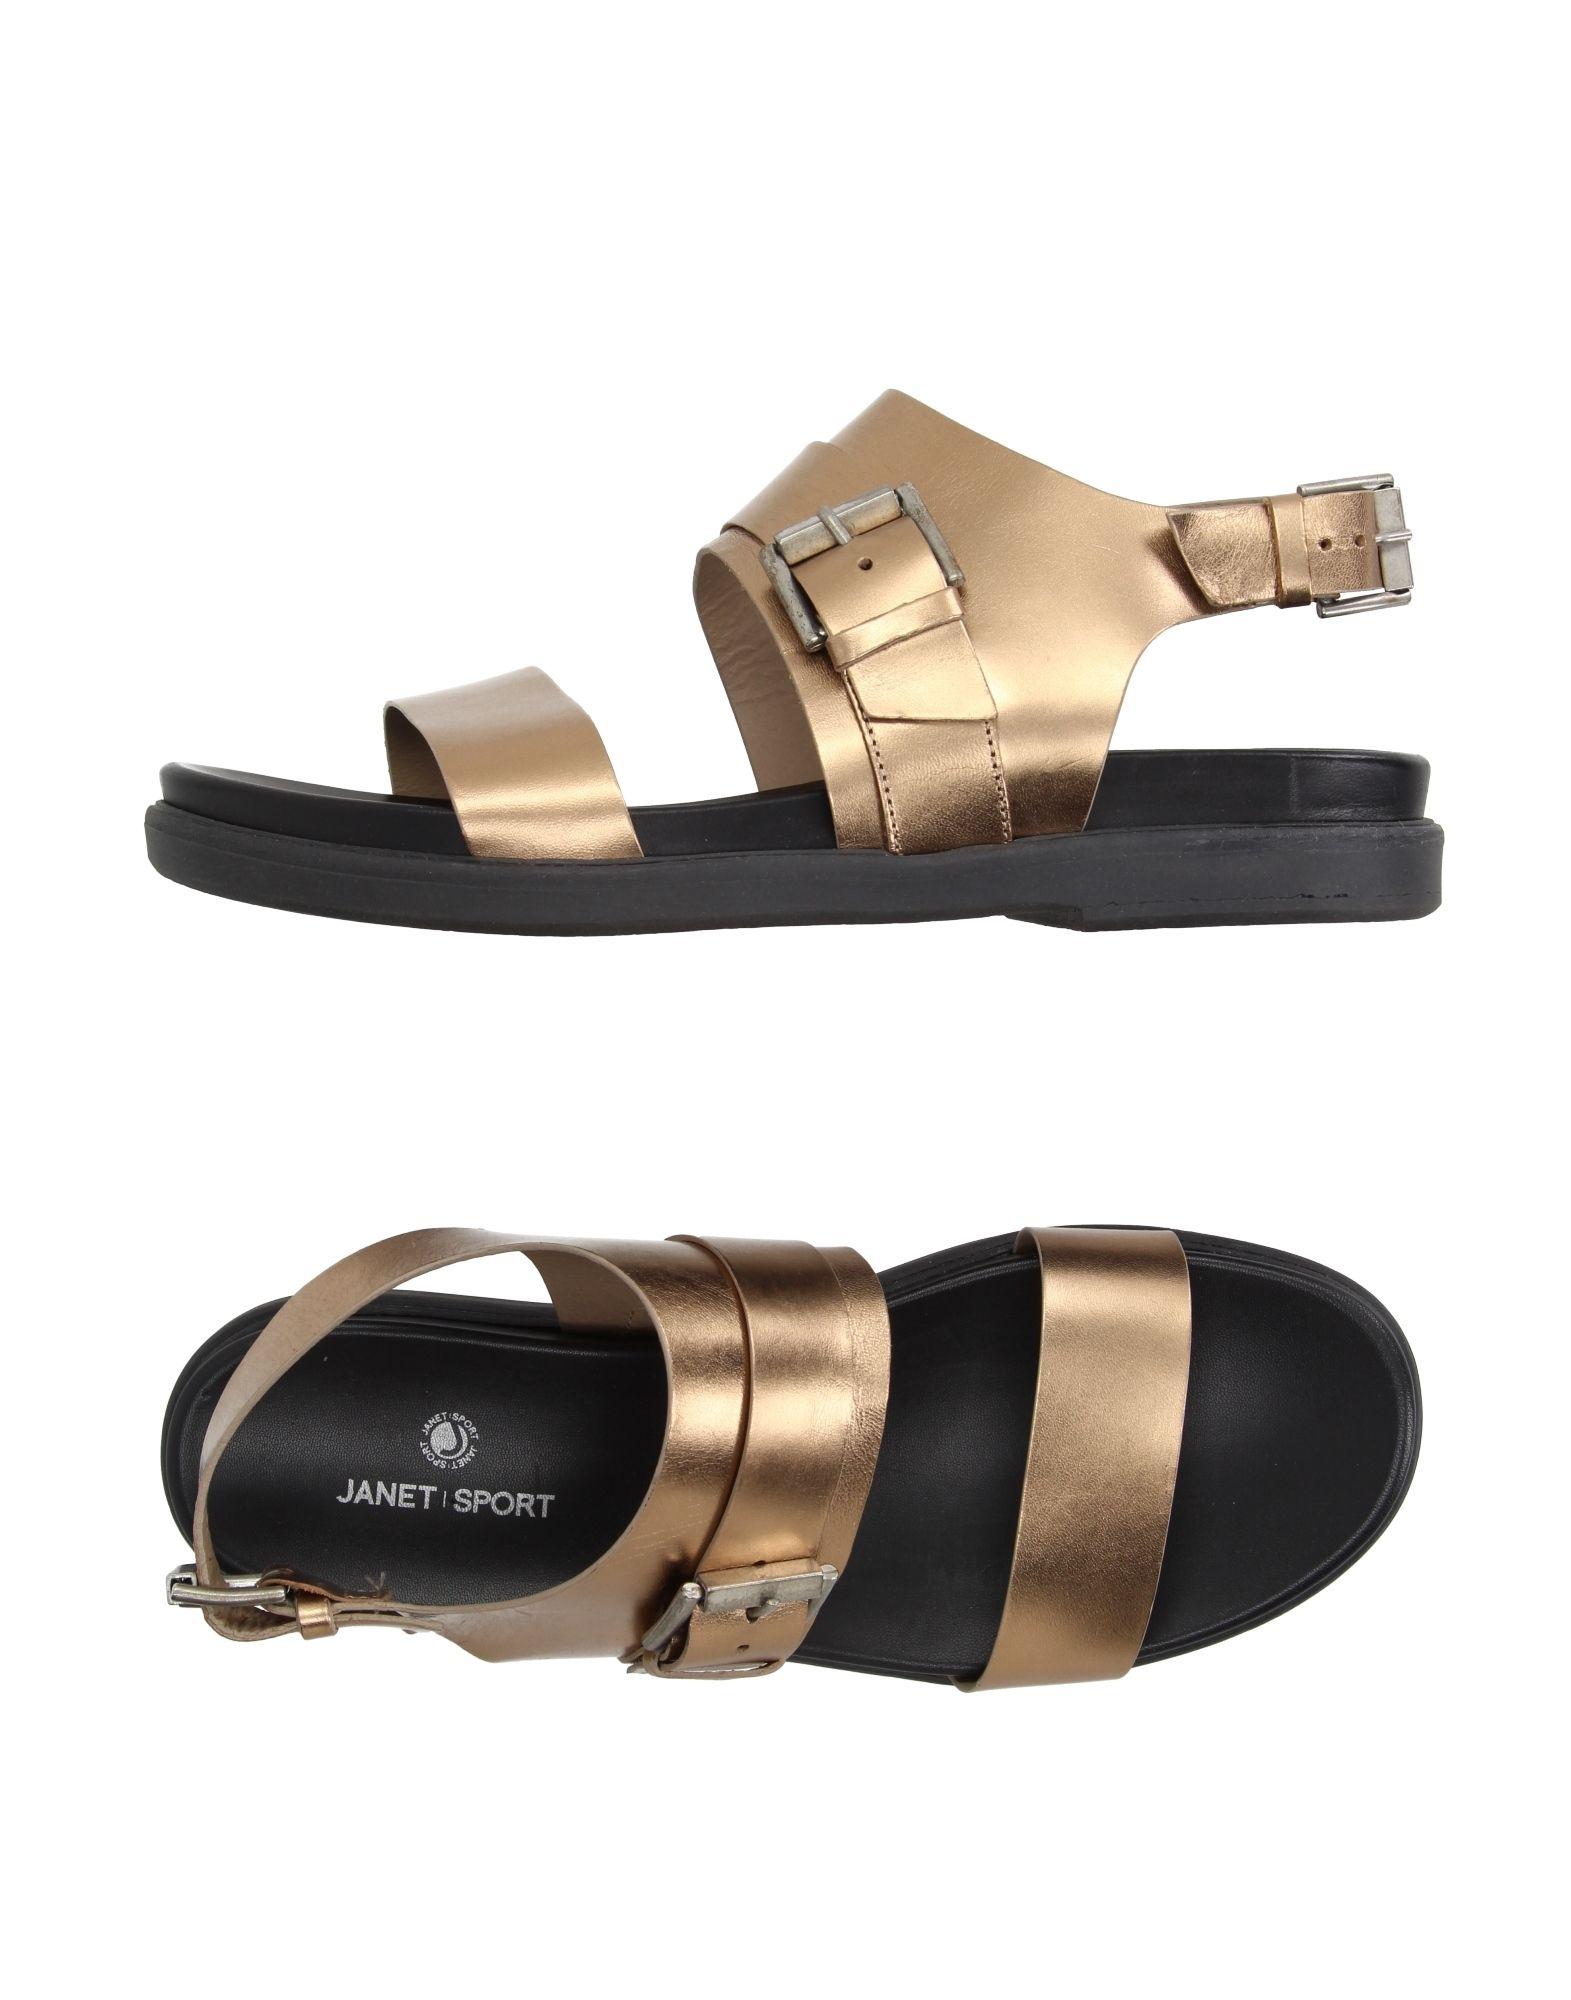 Janet Sport Sandalen Damen  11182740AE Gute Qualität beliebte Schuhe